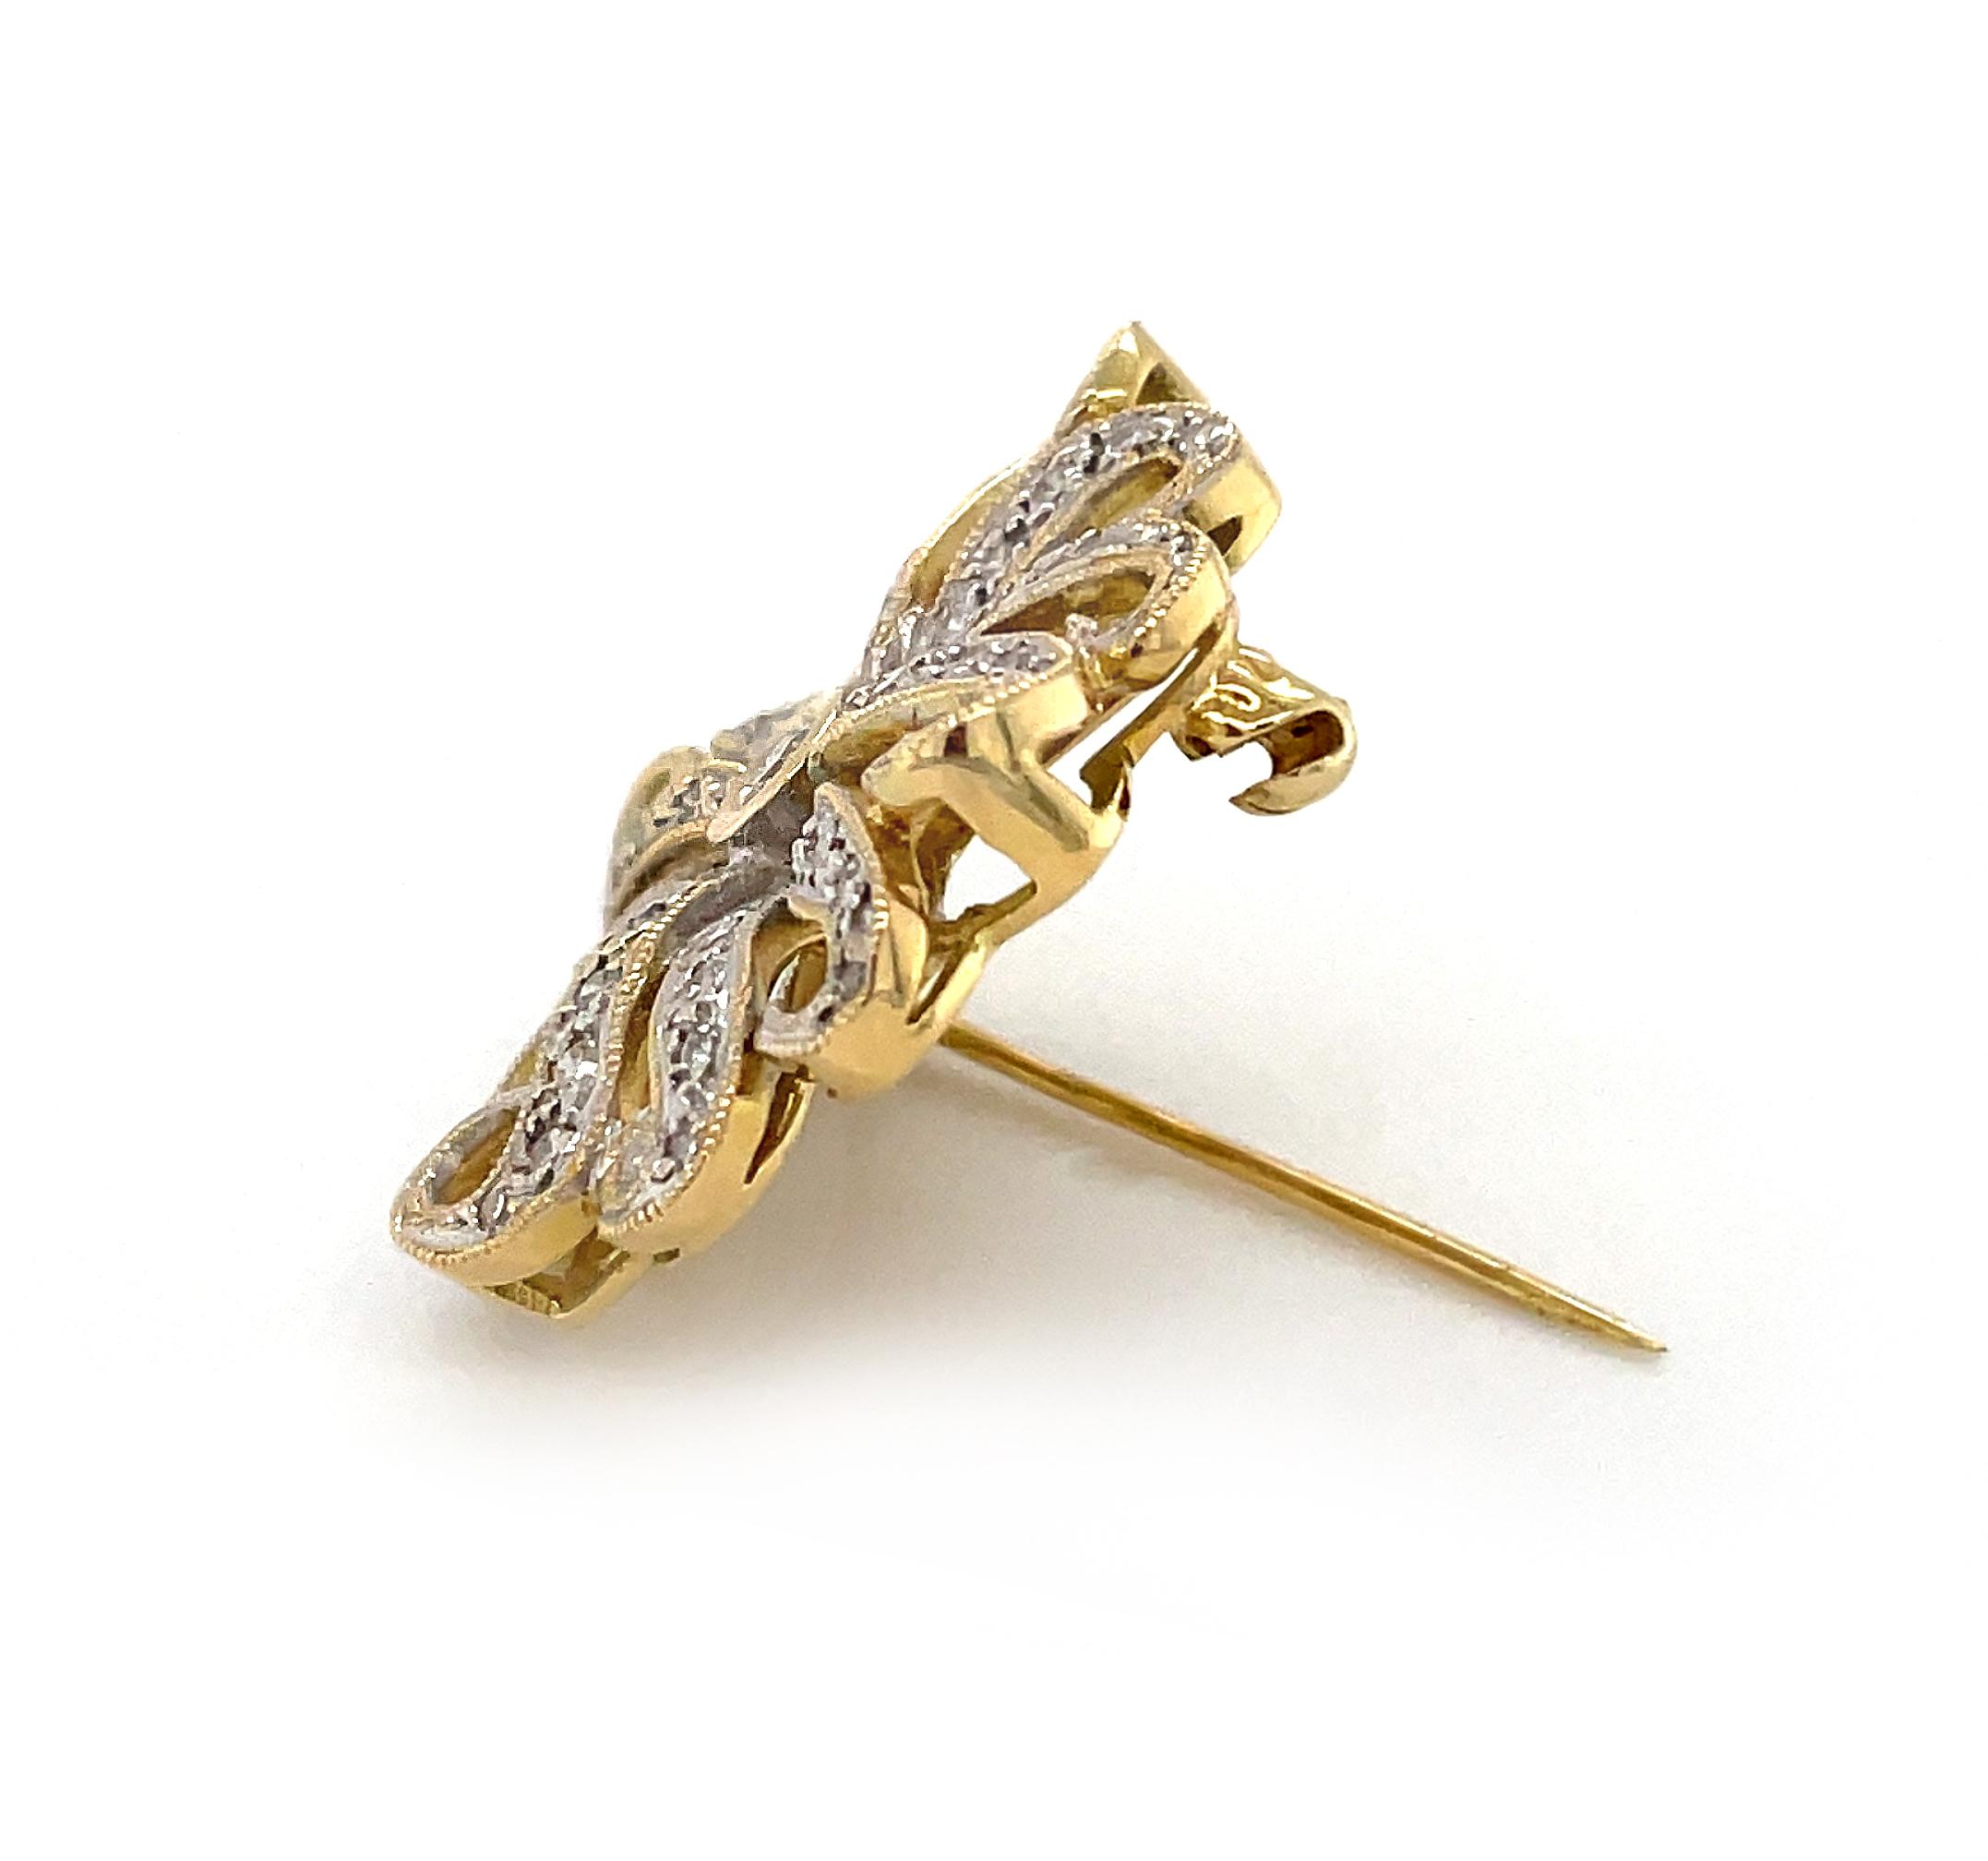 18k Yellow Gold Brilliant Cut Diamond Flower Brooch